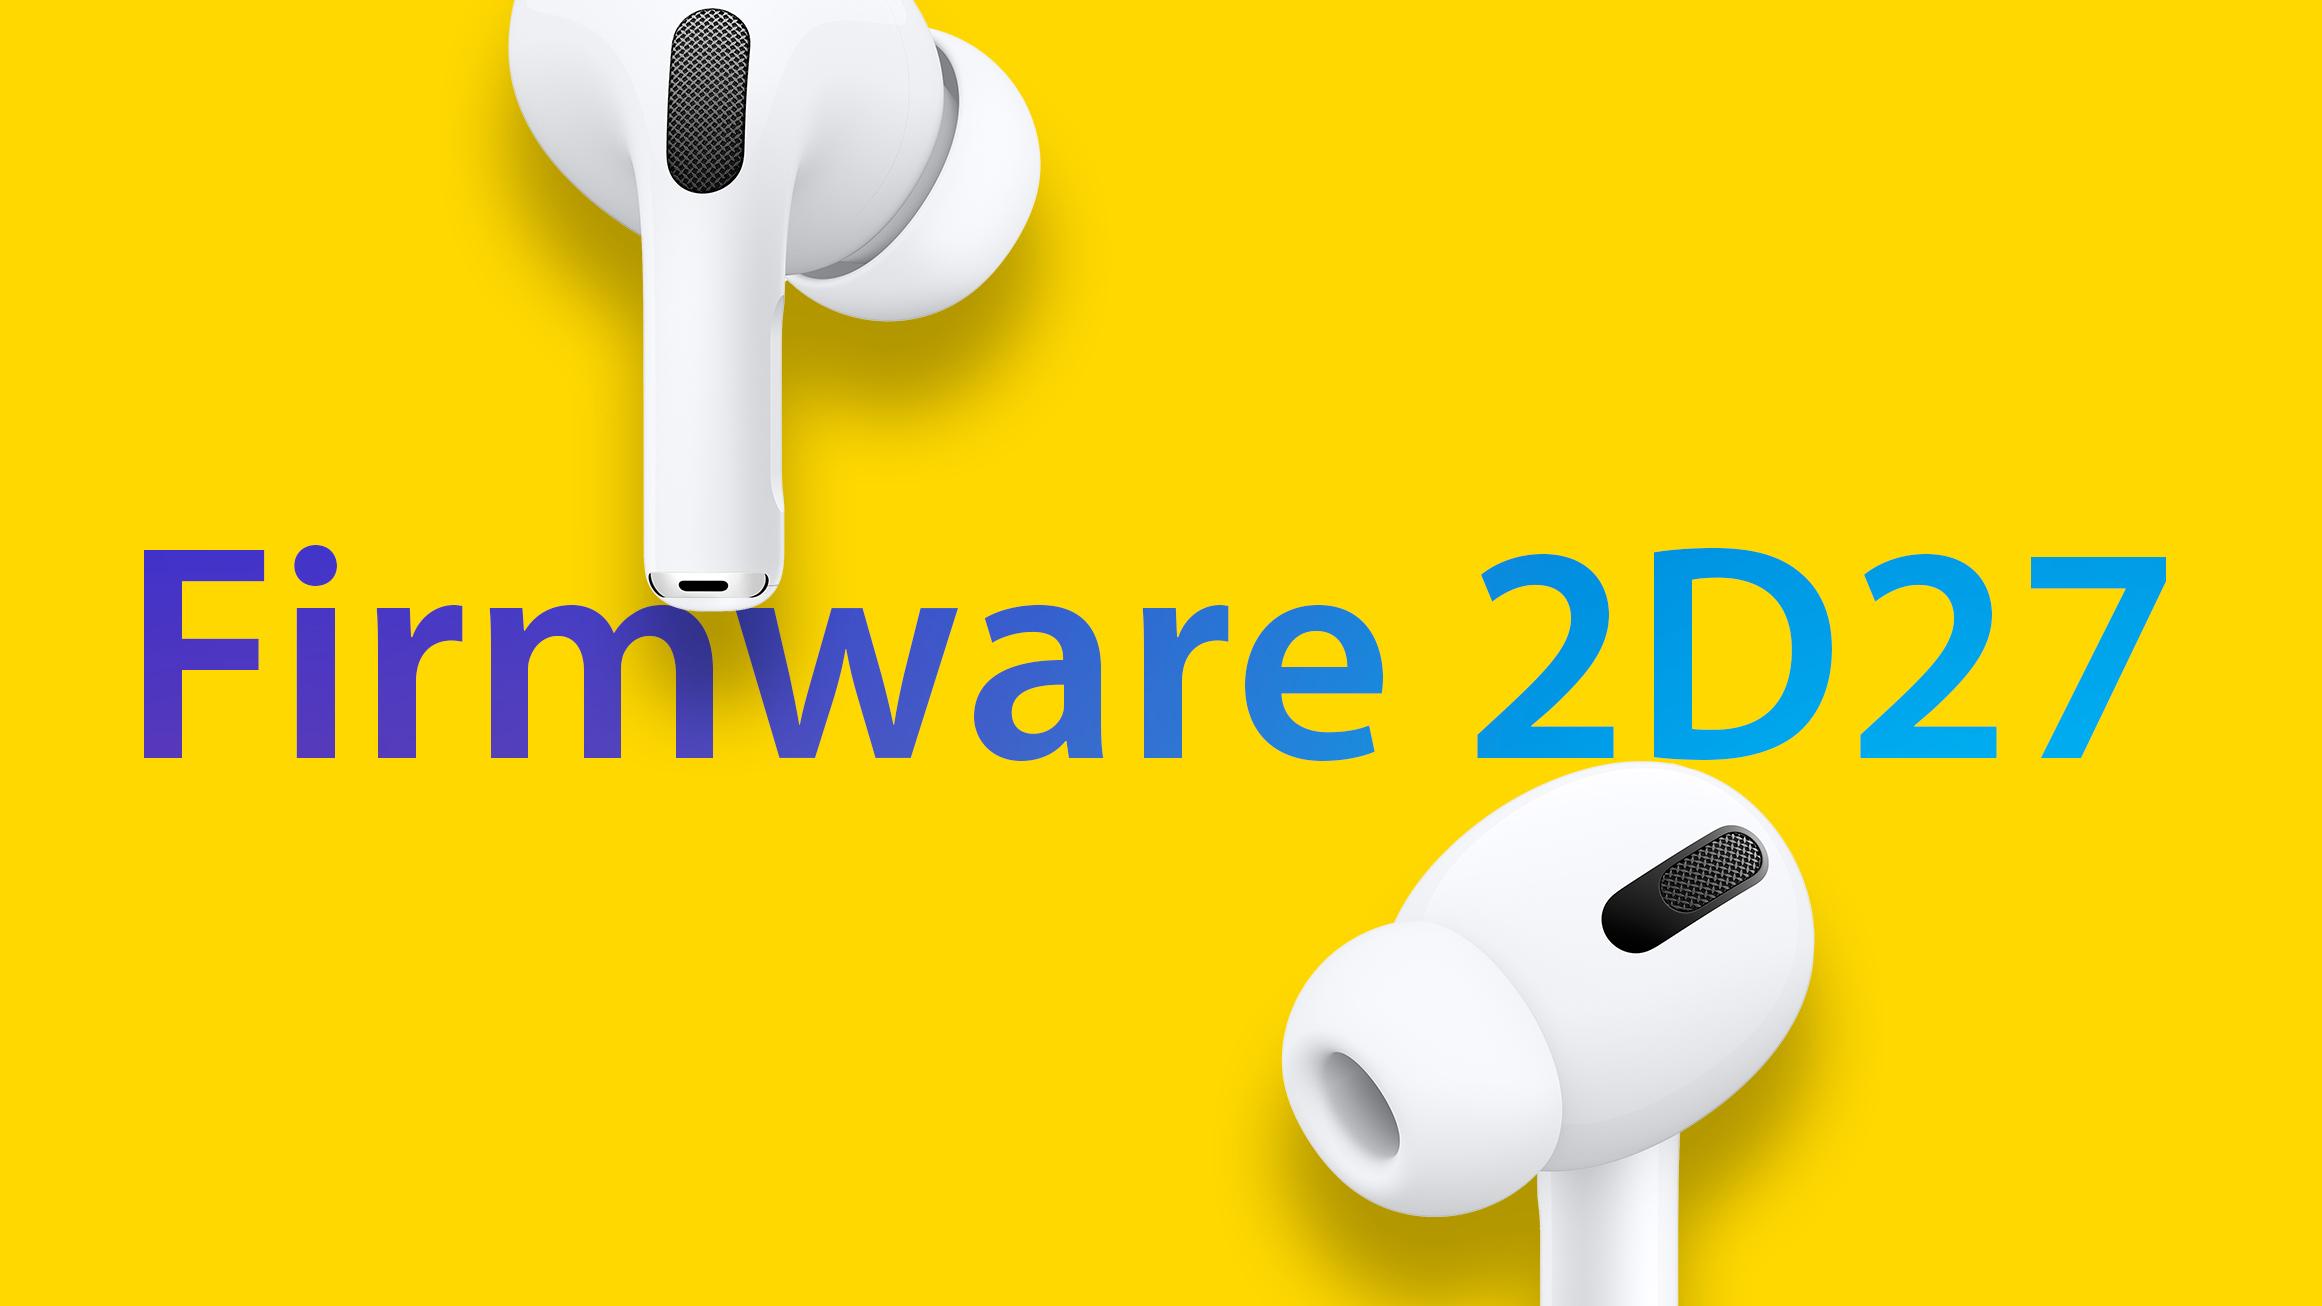 Apple Updates Airpods Pro Firmware To Version 2d27 Macrumors